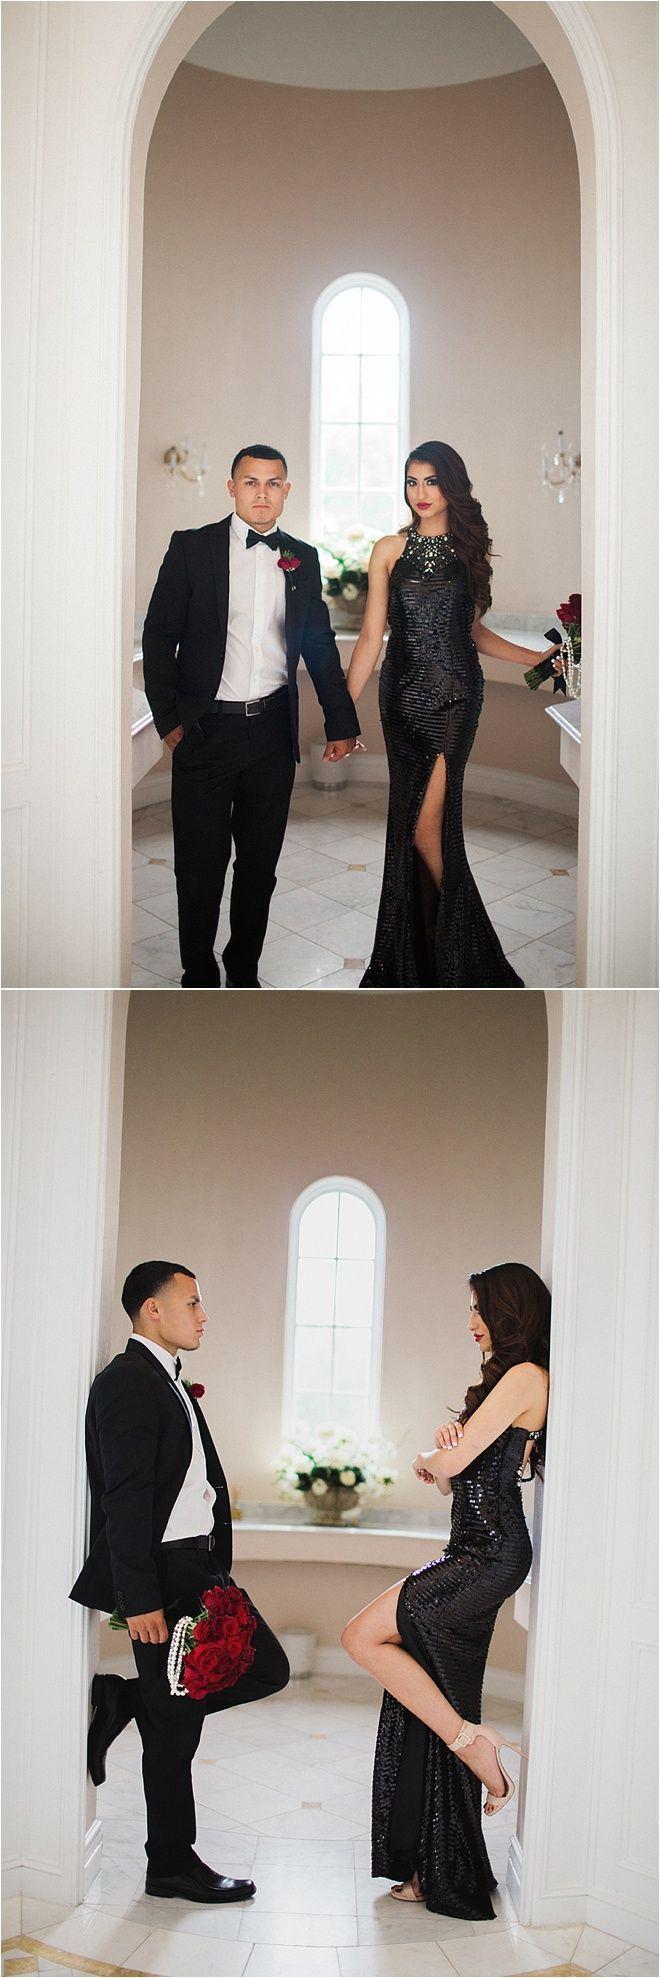 Formal Engagement Photos